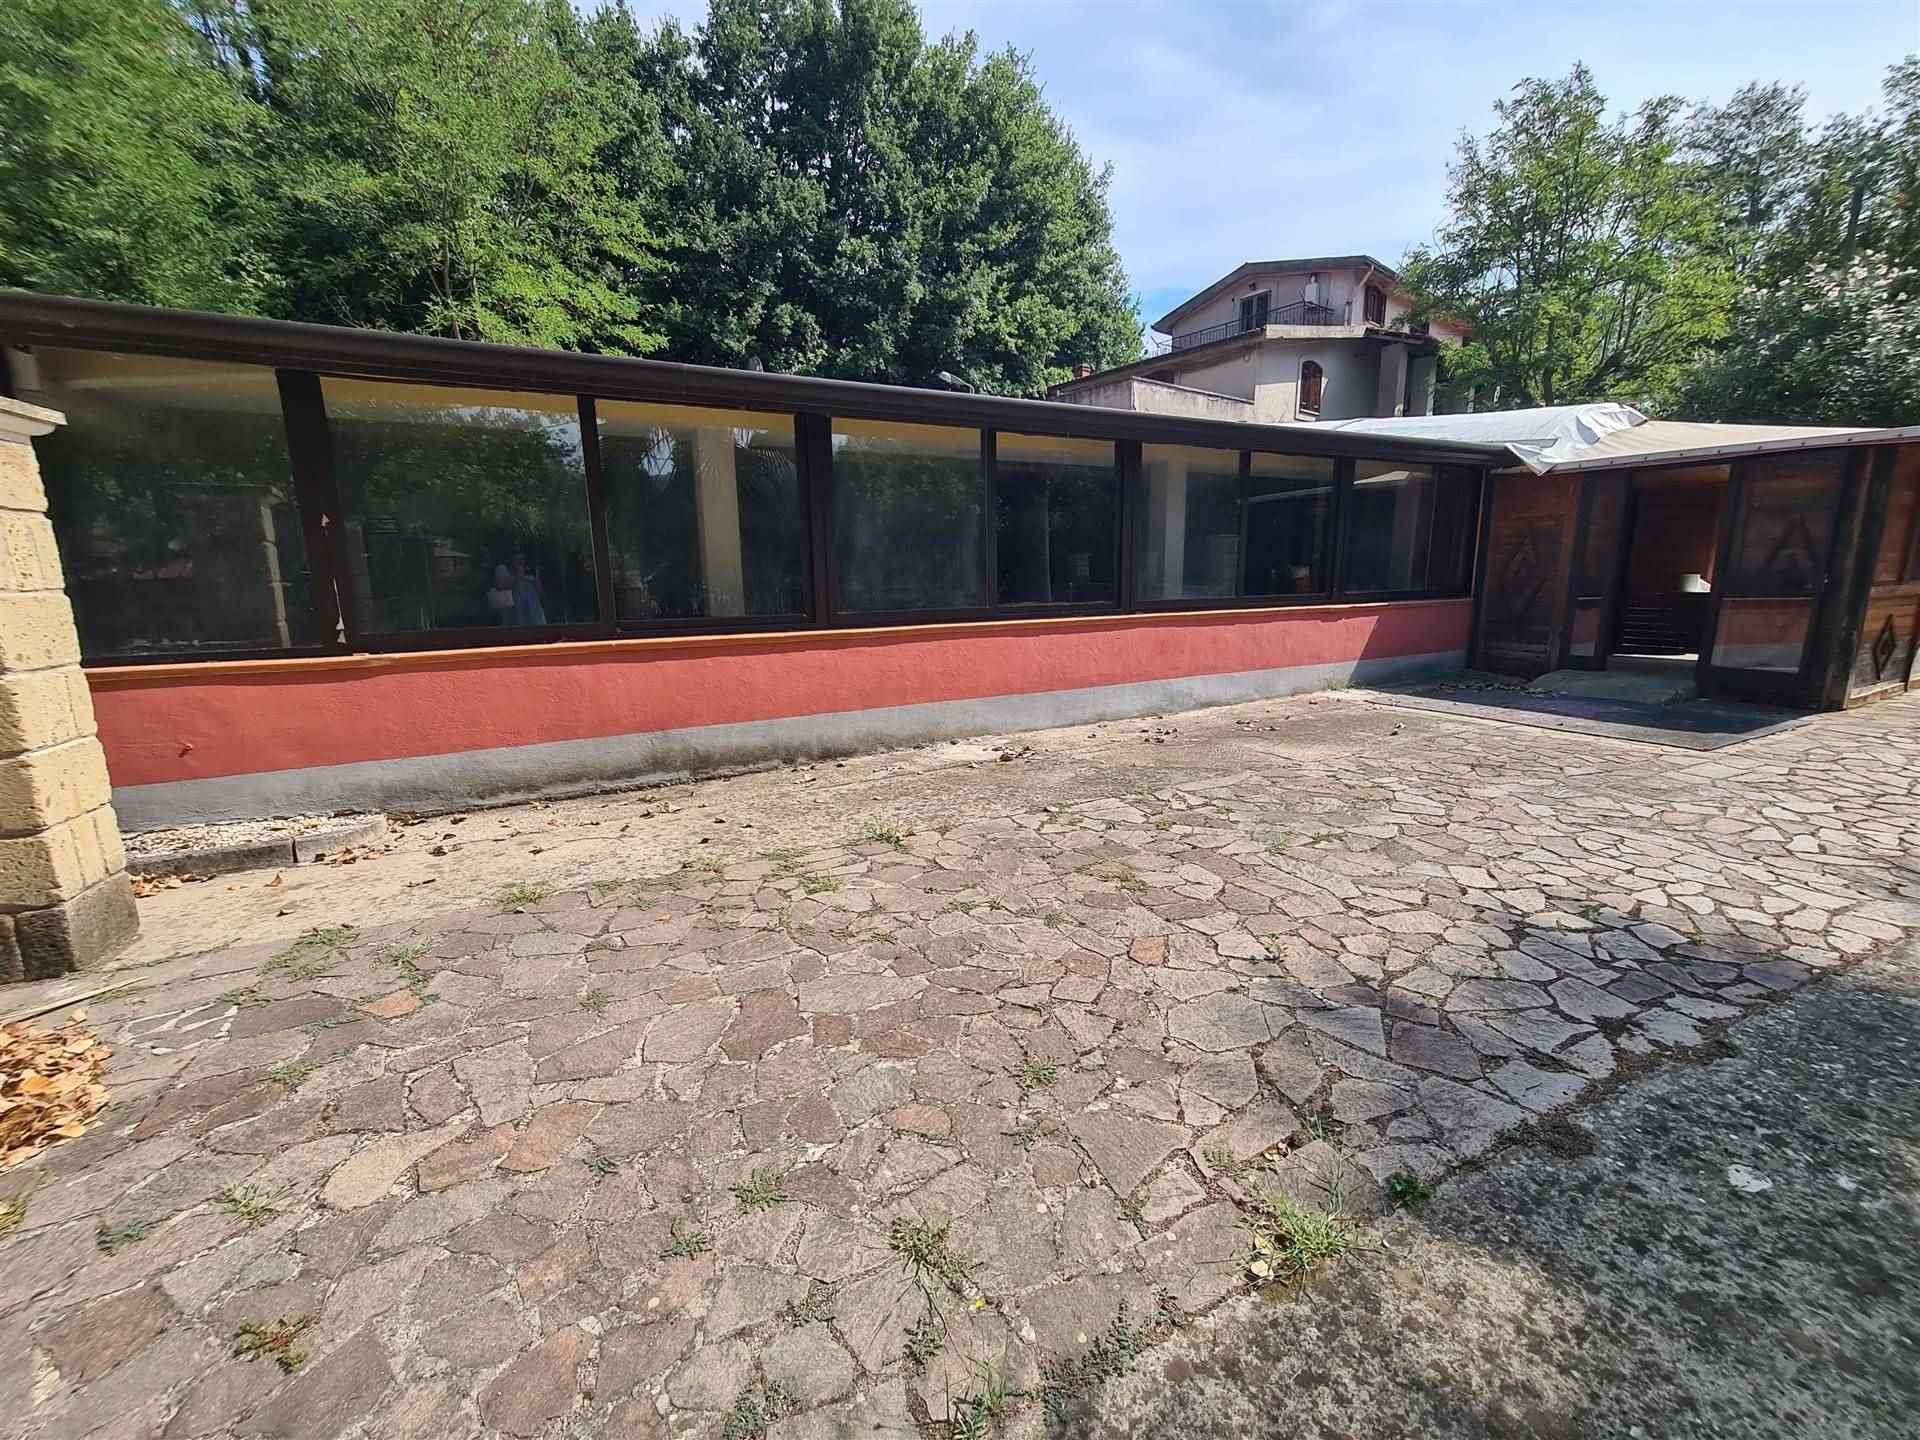 LV044E-Attivit? Commerciale-PONTELATONE-Via-Ponte-Pellegrino